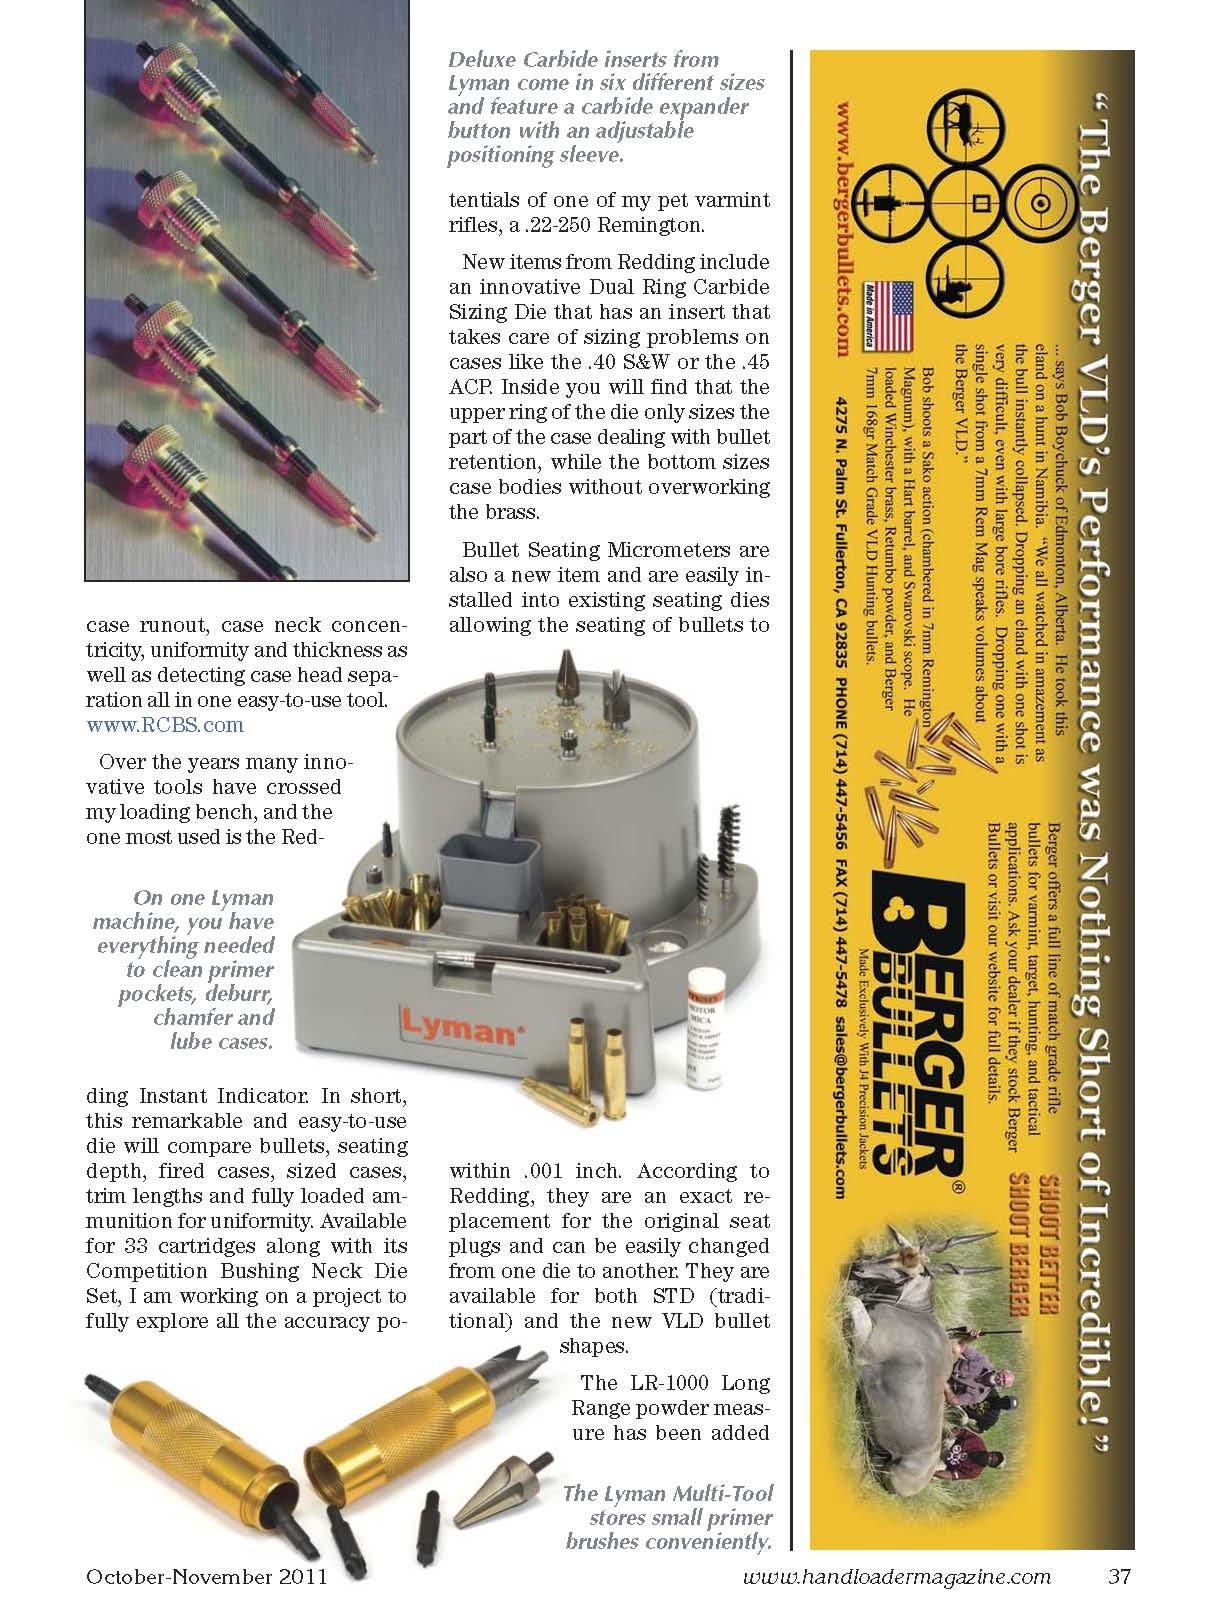 Handloader Ammunition Reloading Journal - October 2011 - Issue